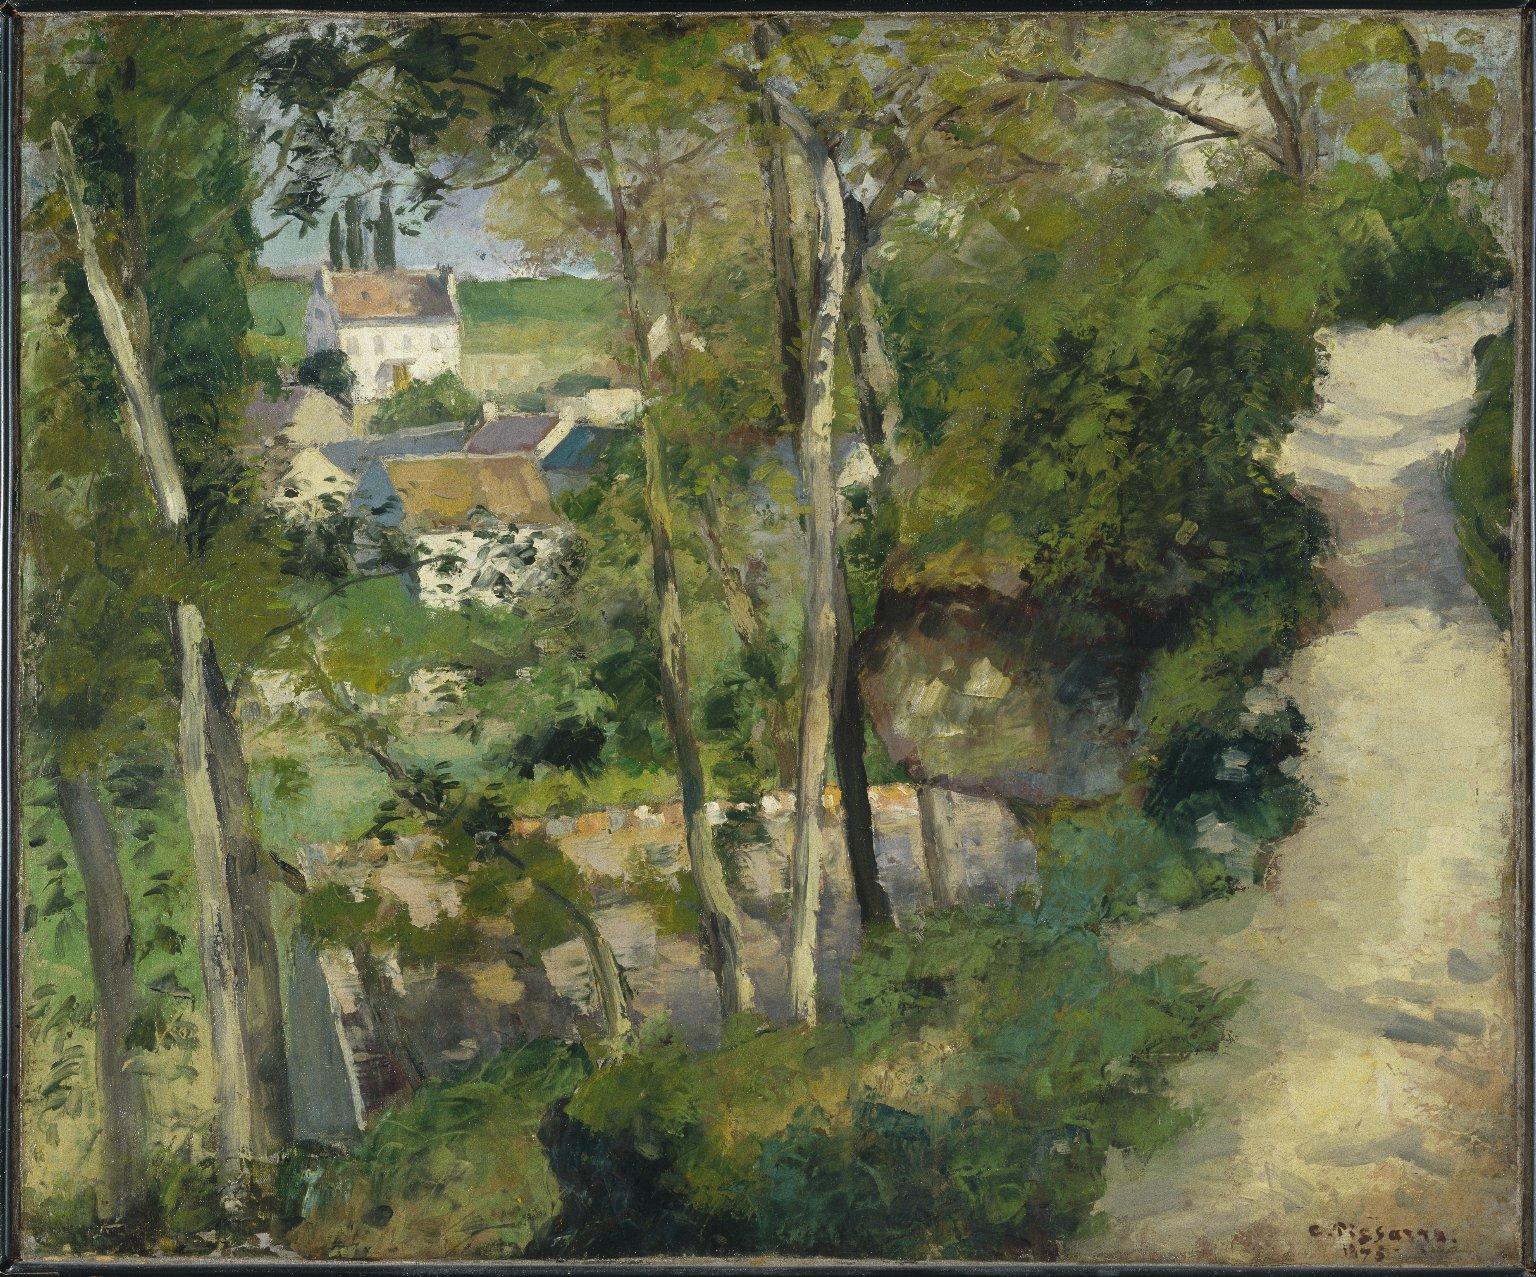 Pissarro_The Climbing Path, l'Hermitage, Pontoise 1875 2